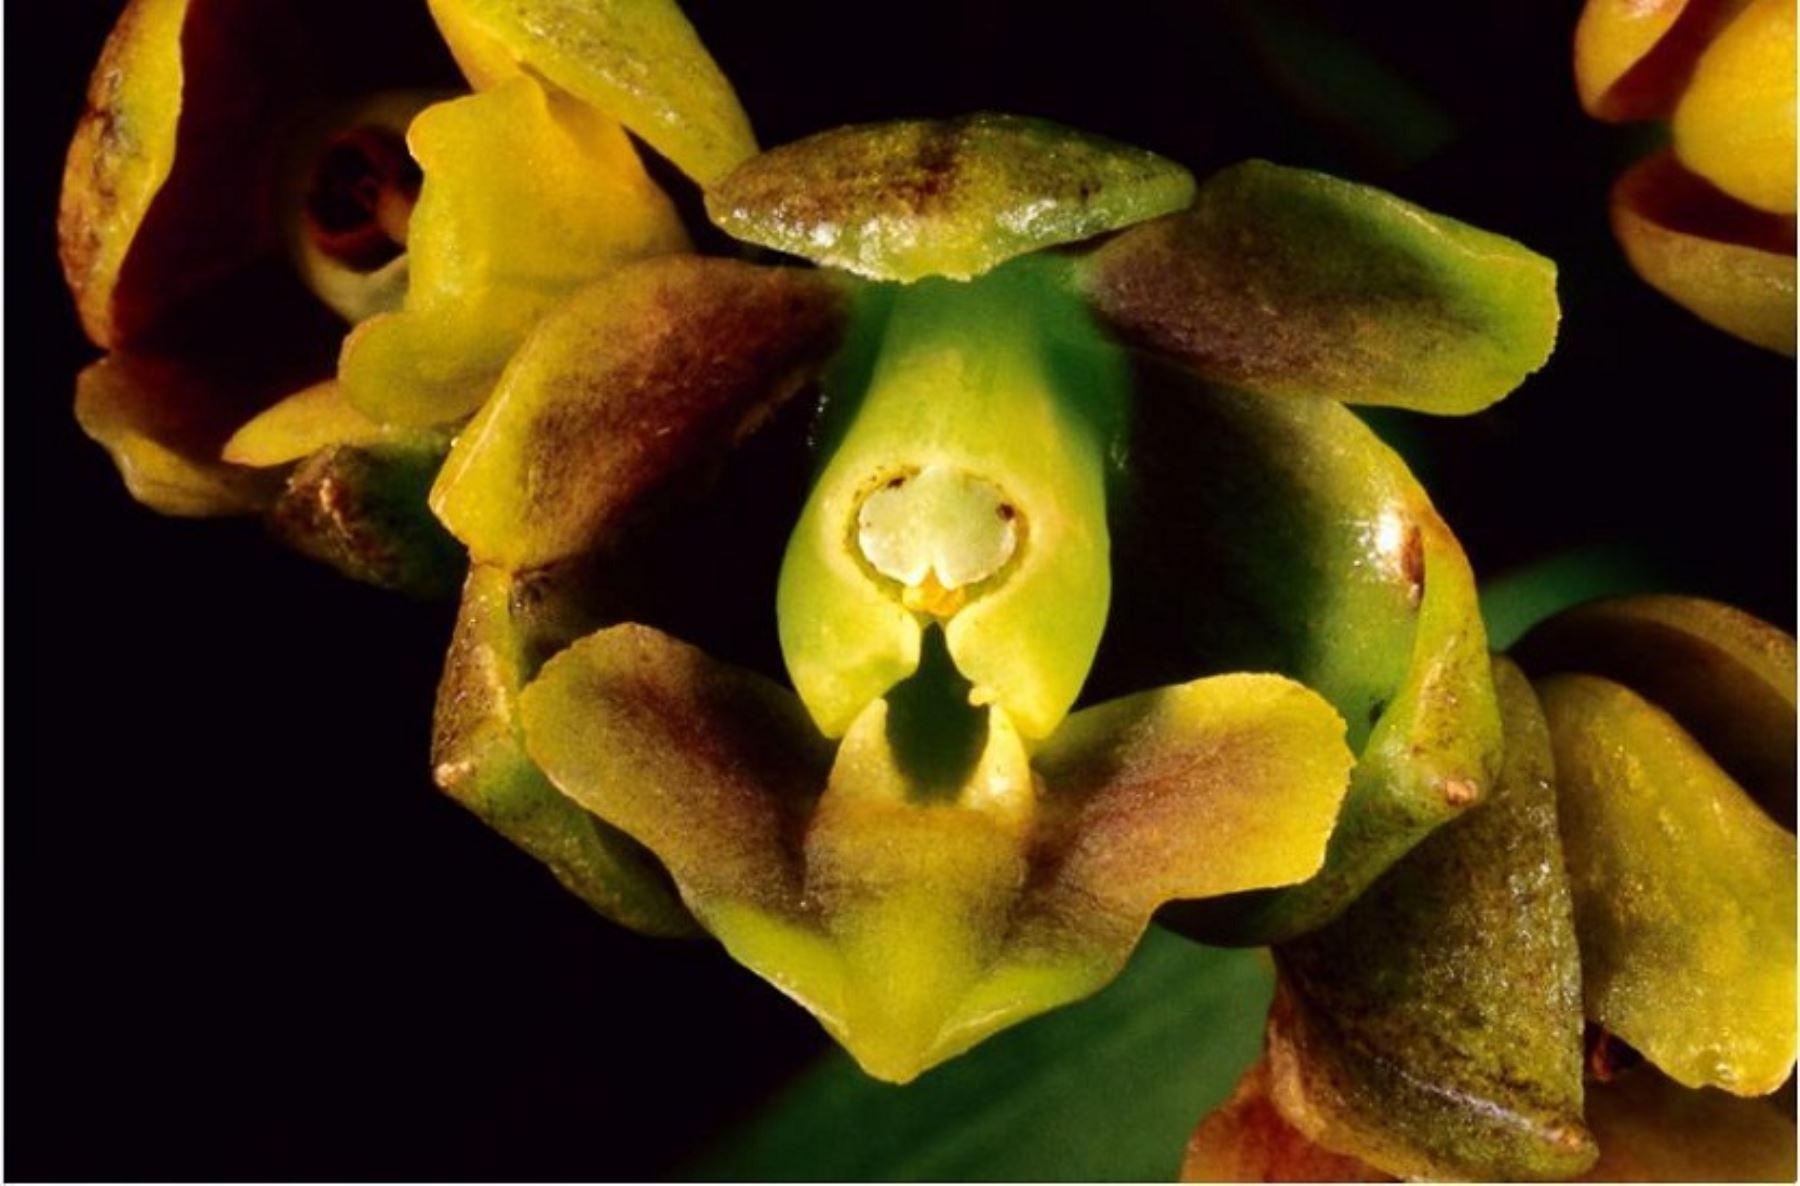 Se trata de especies Epidendrum Ochoae, Epidendrum Incahuamanii, y Epidendrum Mormontoy.